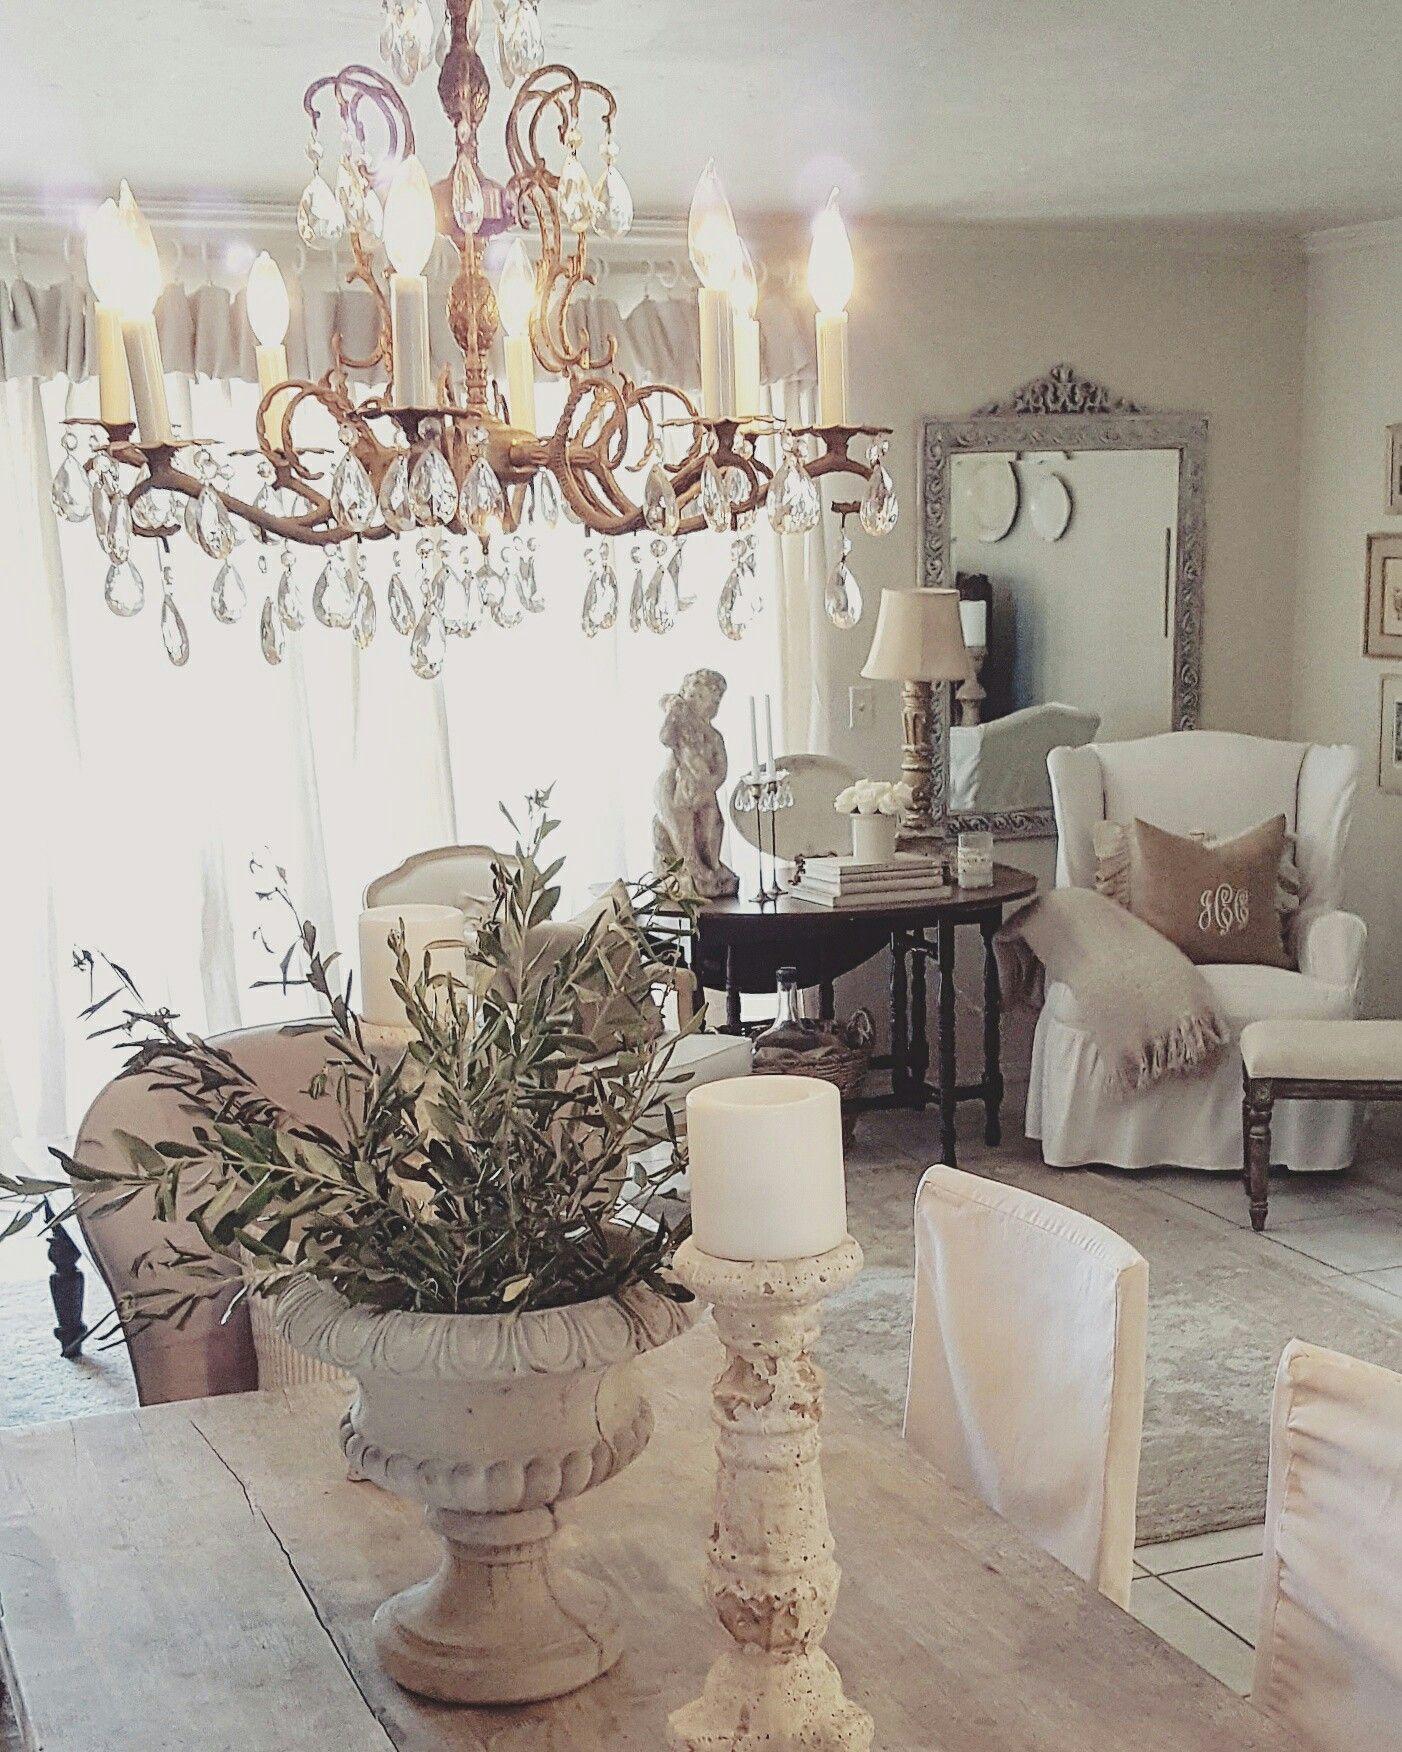 Pin by Jodi on ~Beautiful~ | Pinterest | French country interiors ...